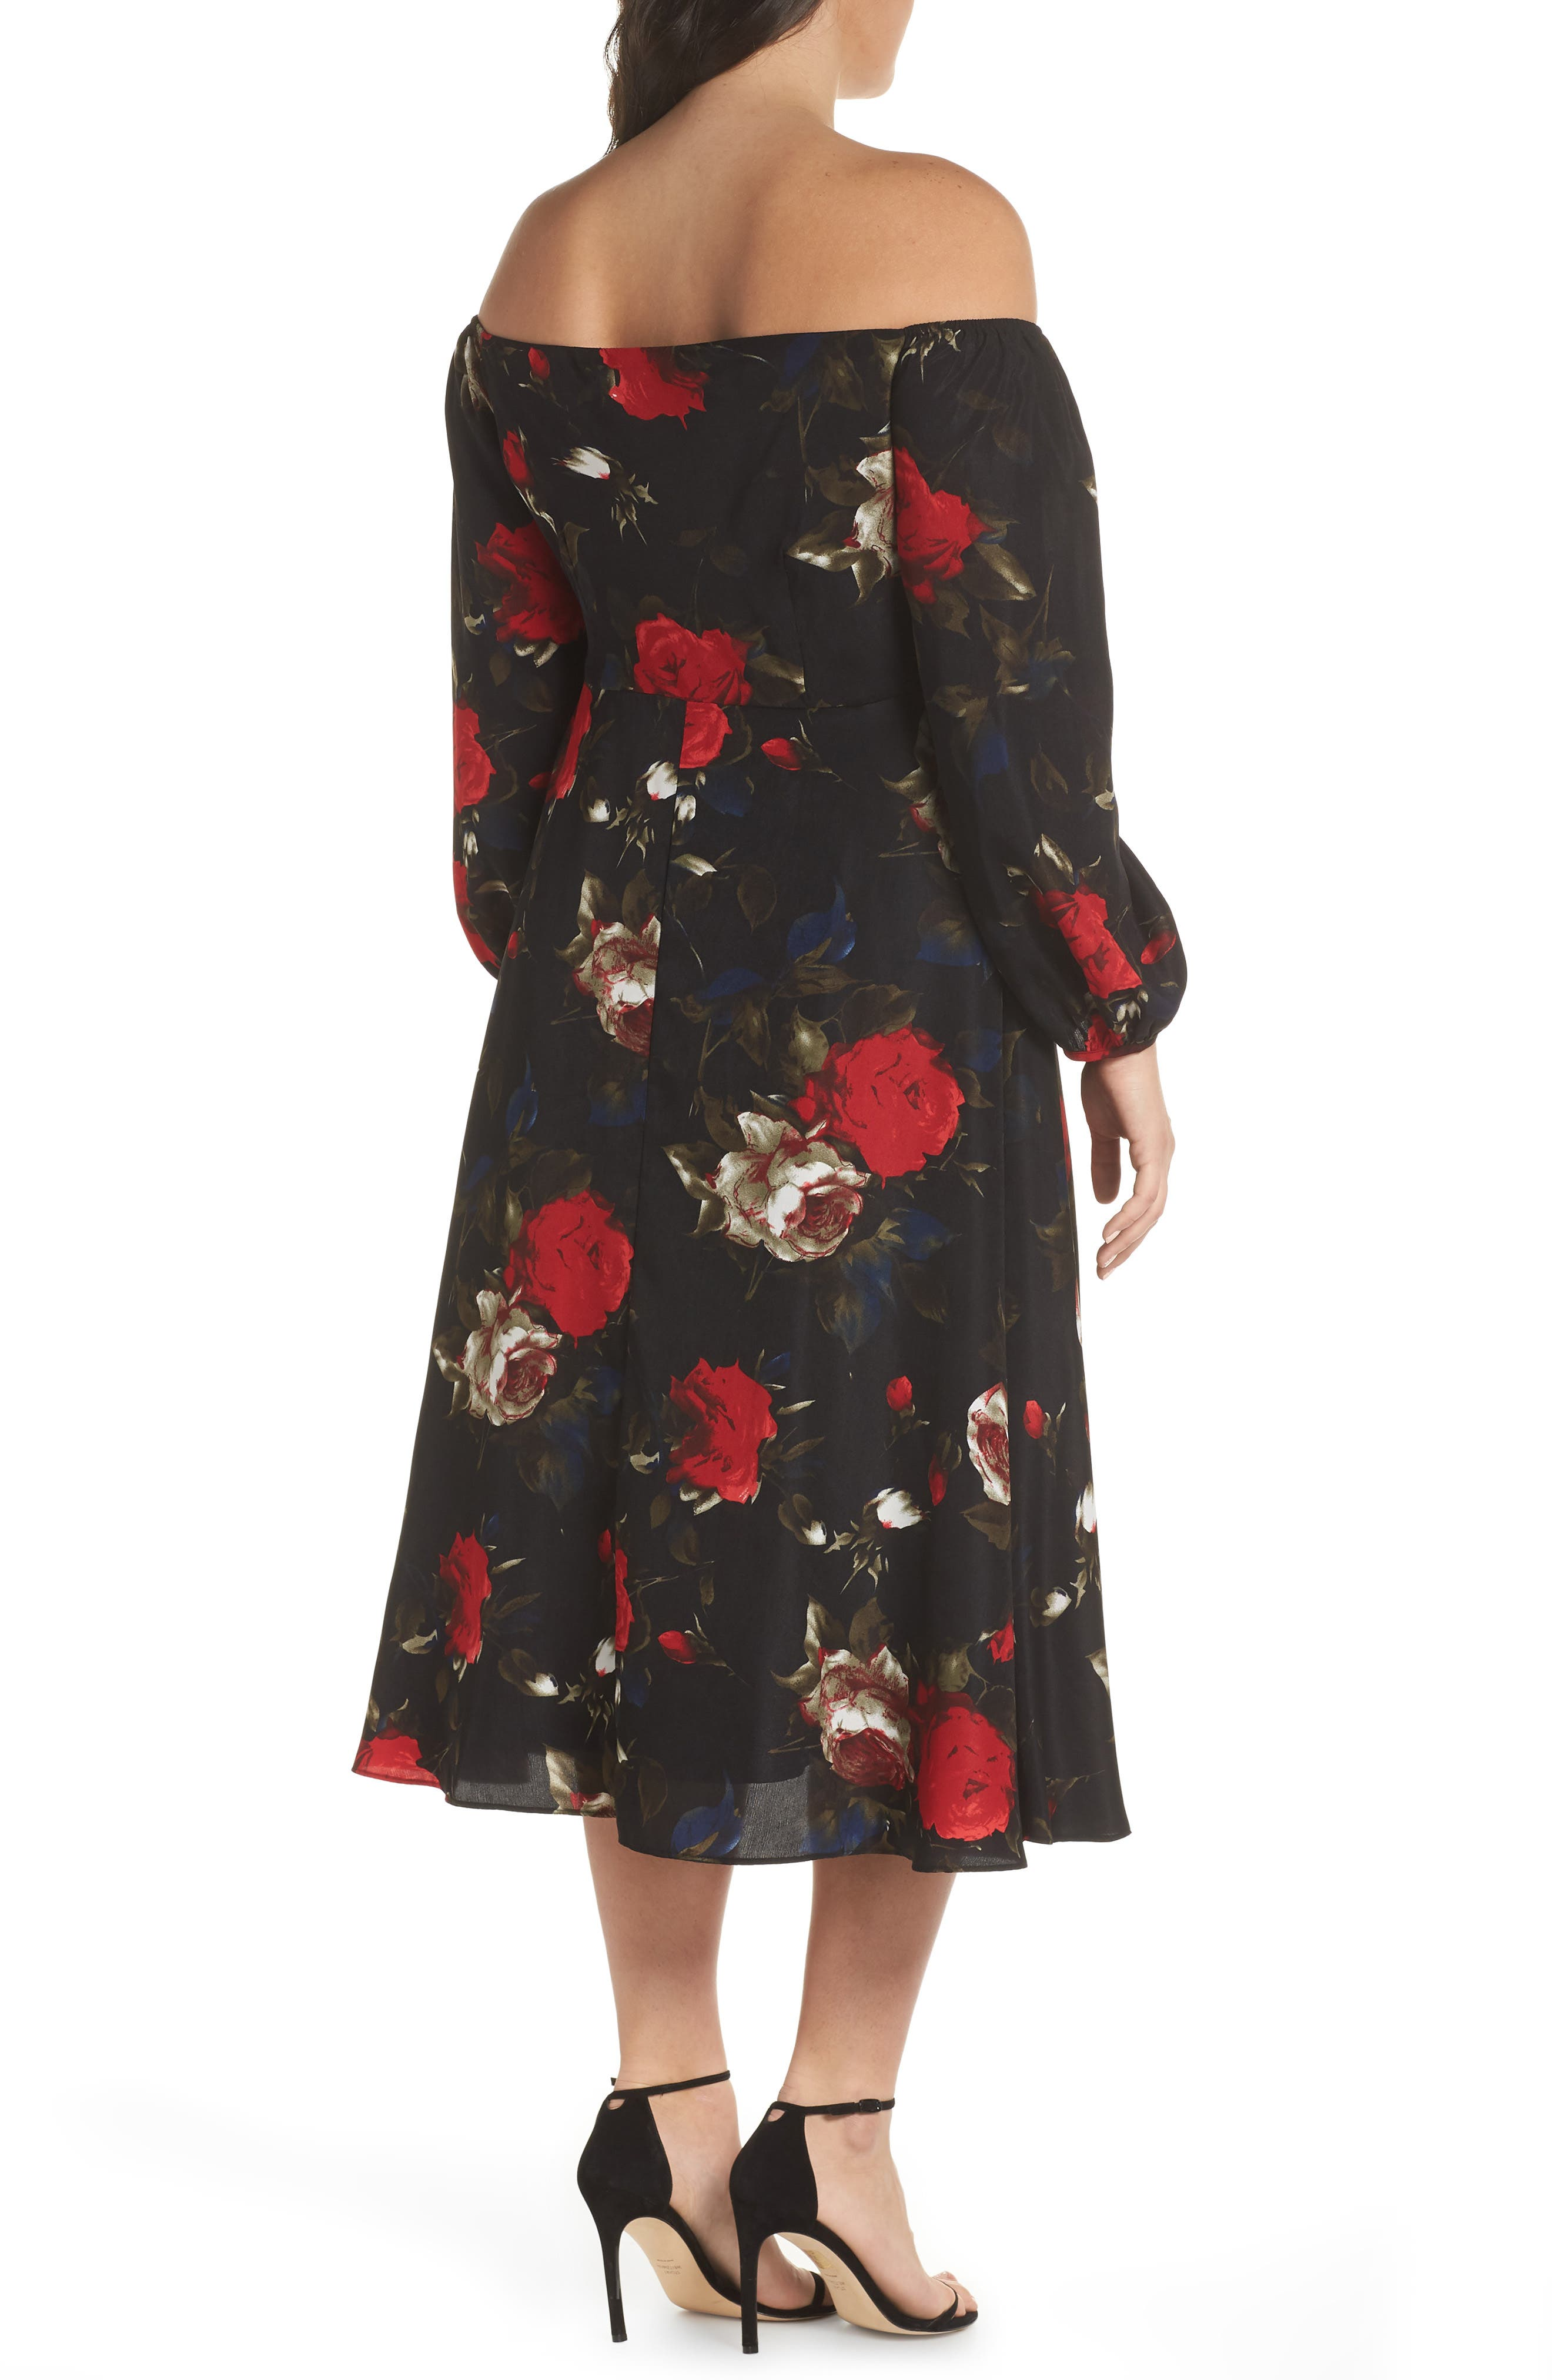 Off the Shoulder Midi Dress,                             Alternate thumbnail 9, color,                             BLACK LUSH ROSE FLORAL